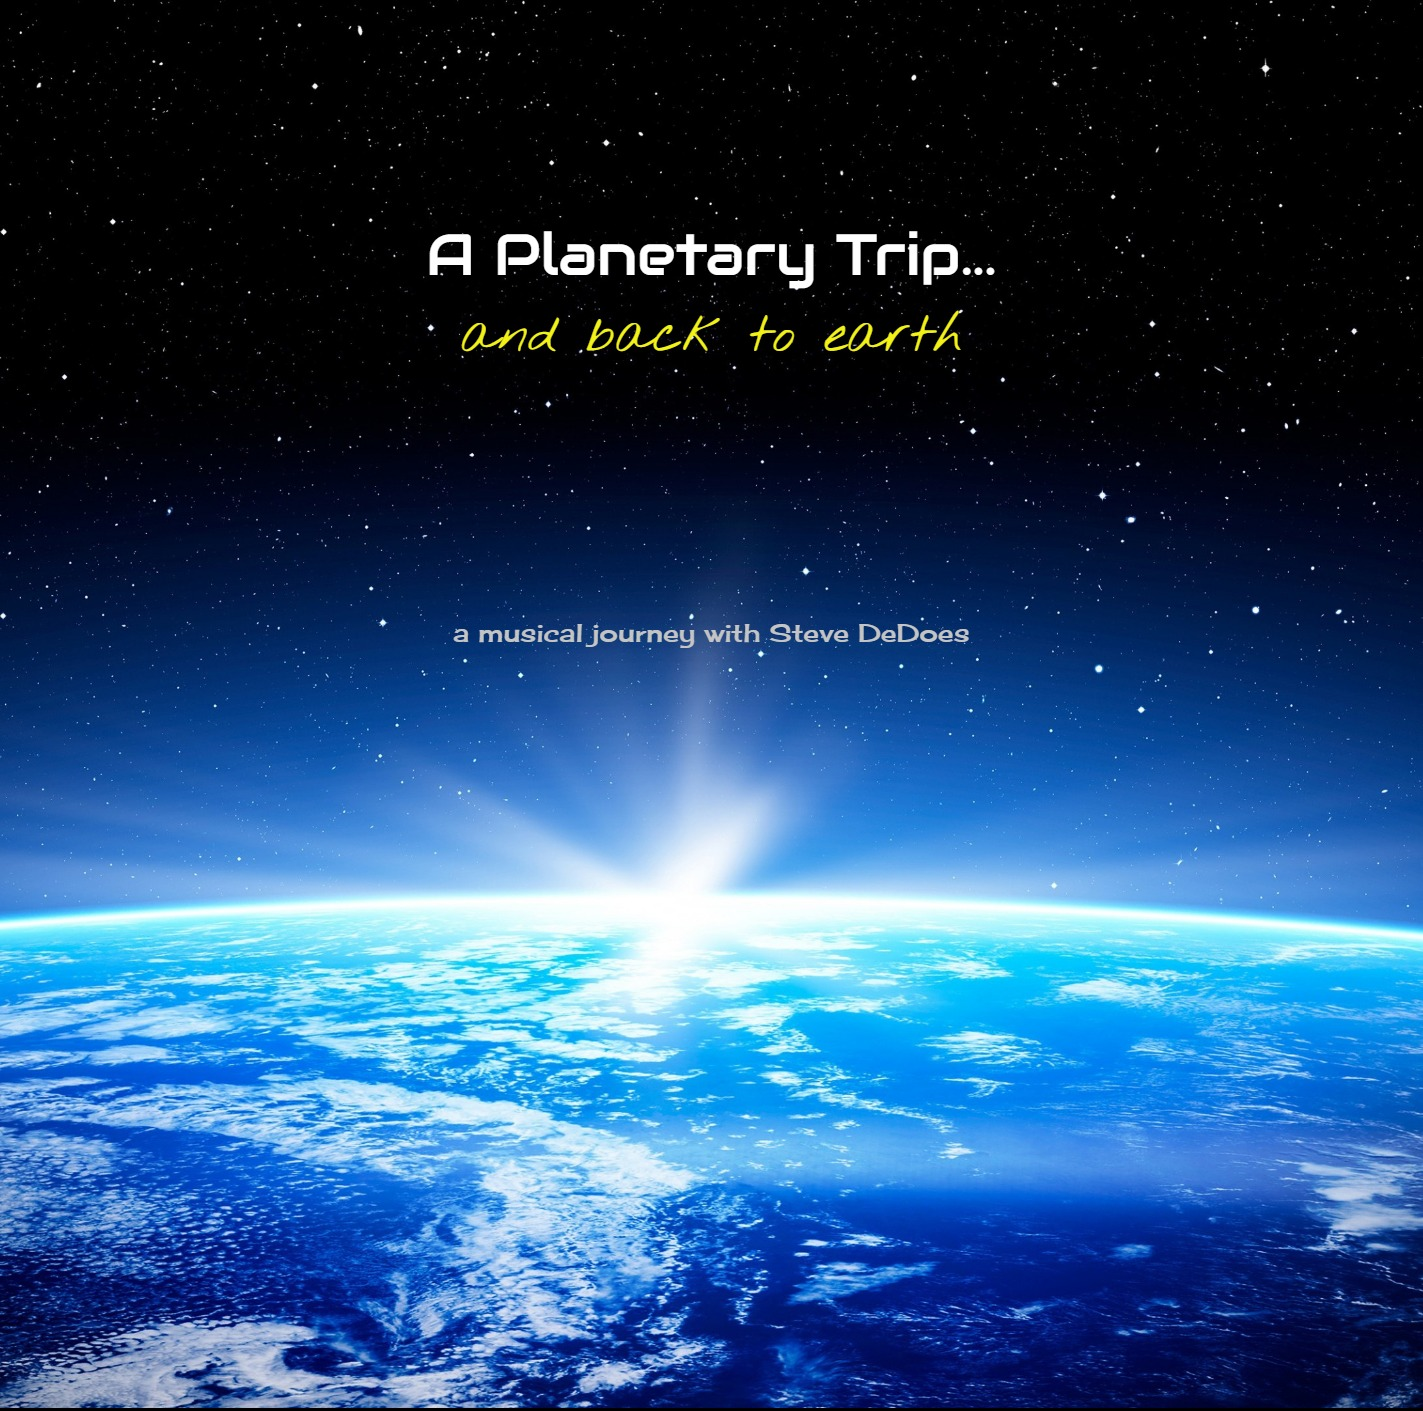 """A Planetary Trip..."" - Steve DeDoes"